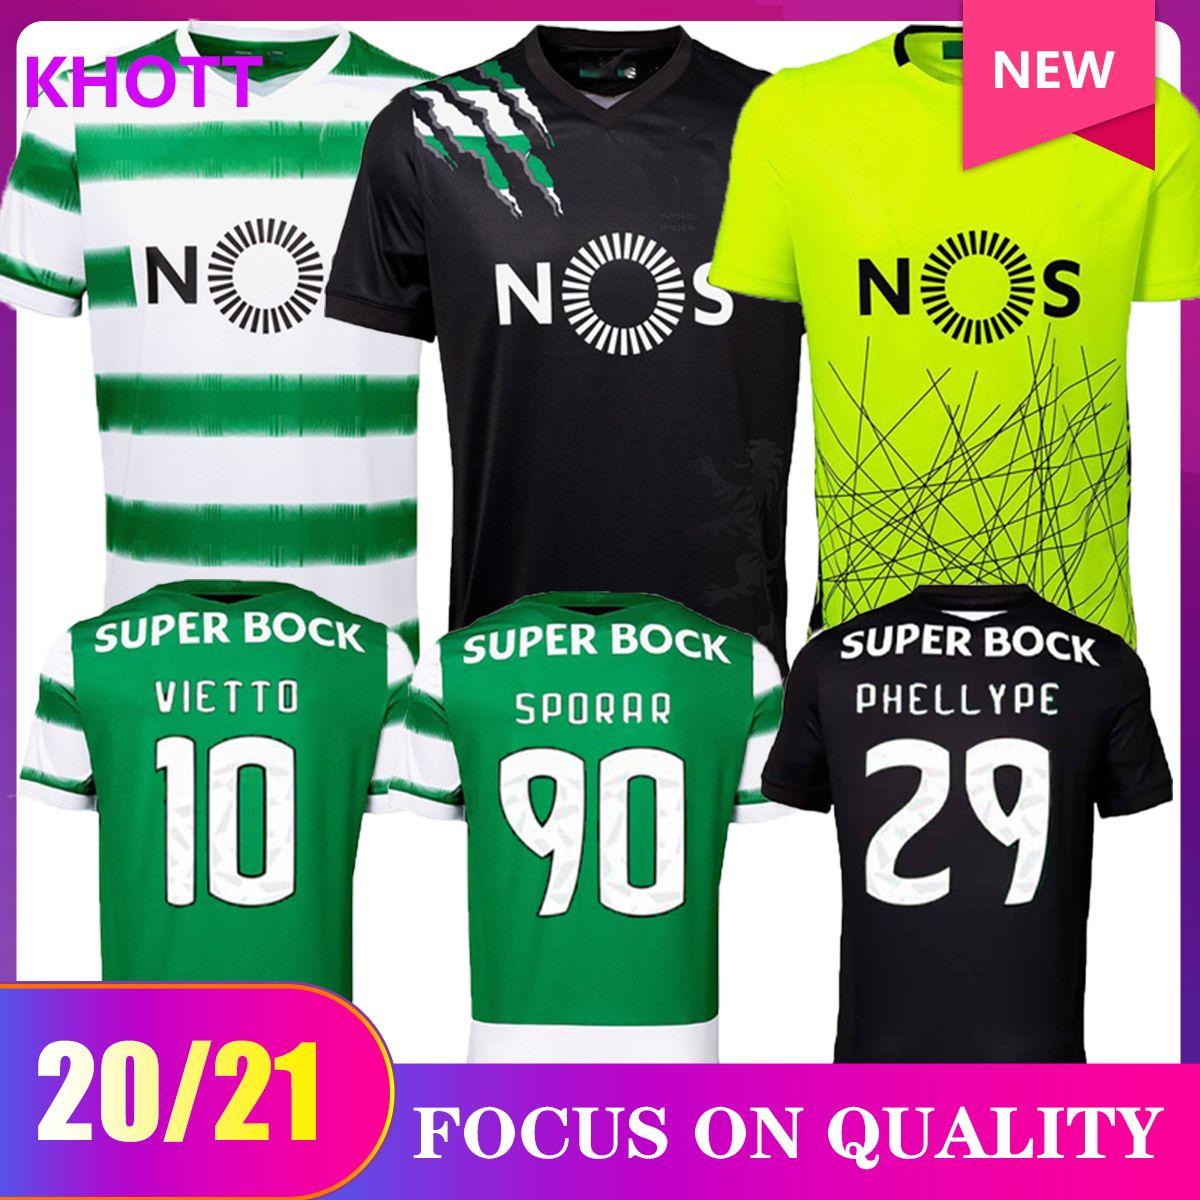 20 21 Sporting Clube de Sporting CP Lissabon Fußball Trikots Phellype 2020 2020 B.fernandes Soccer Jerseys Lisbona Dost Uomo Maglie da calcio